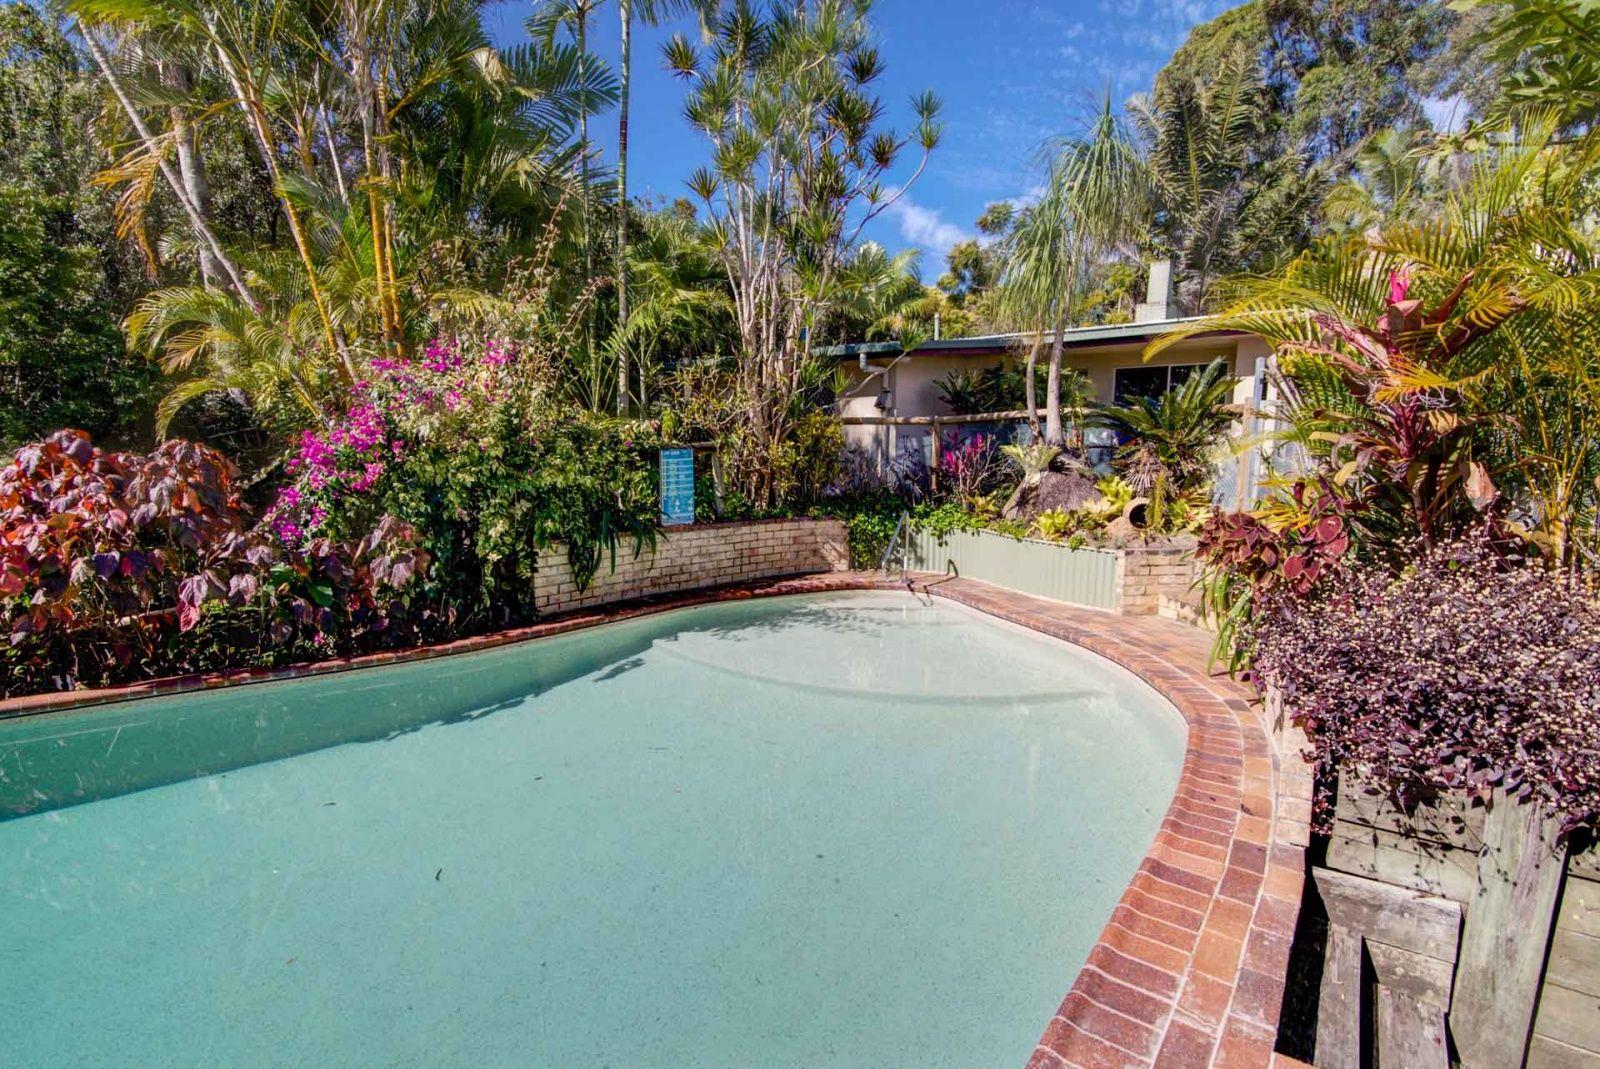 40-44 Sunrise Road, Eumundi QLD 4562